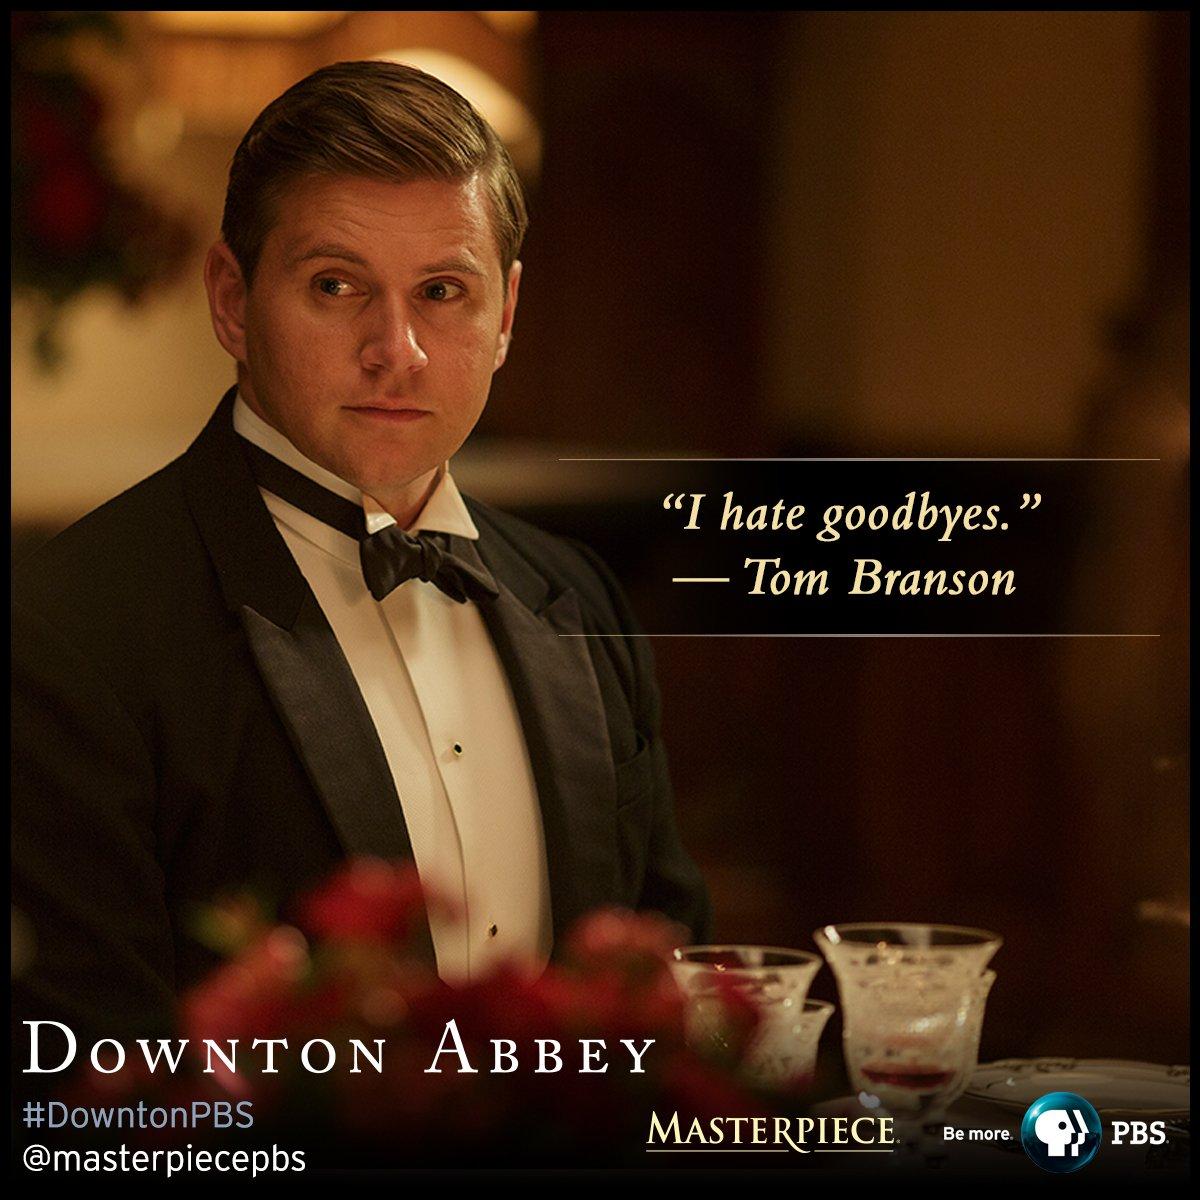 Don't we all, Branson! #DowntonPBS #FarewellDownton https://t.co/61okO5uPTq